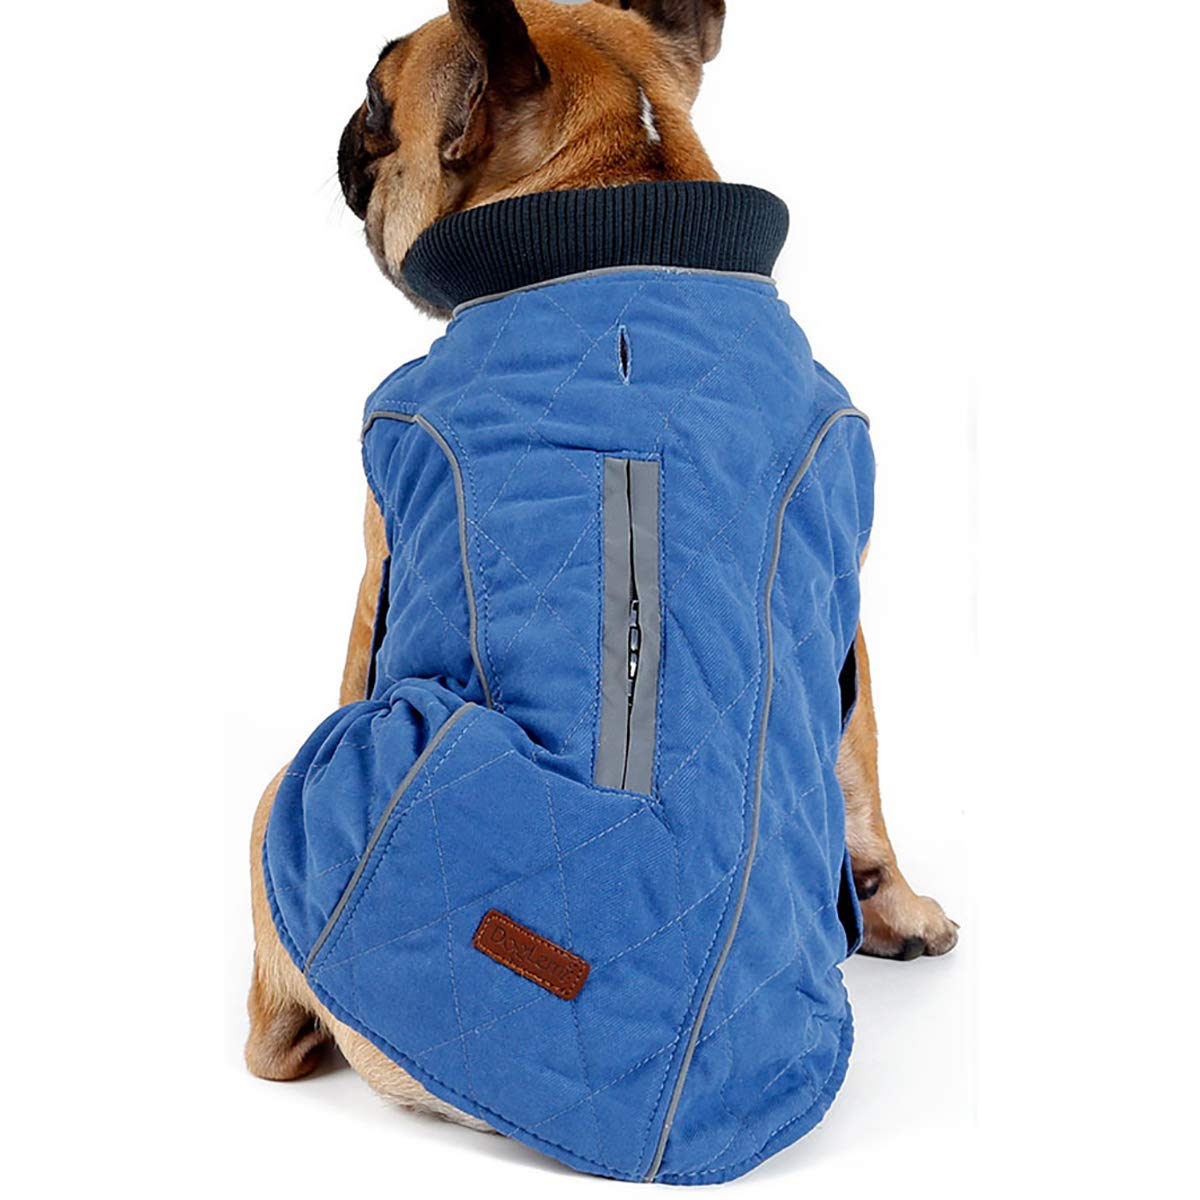 bluee XXXL bluee XXXL Winter Dog Outdoor Warm Clothing, Retro Style Warm Pet Clothes,bluee,XXXL